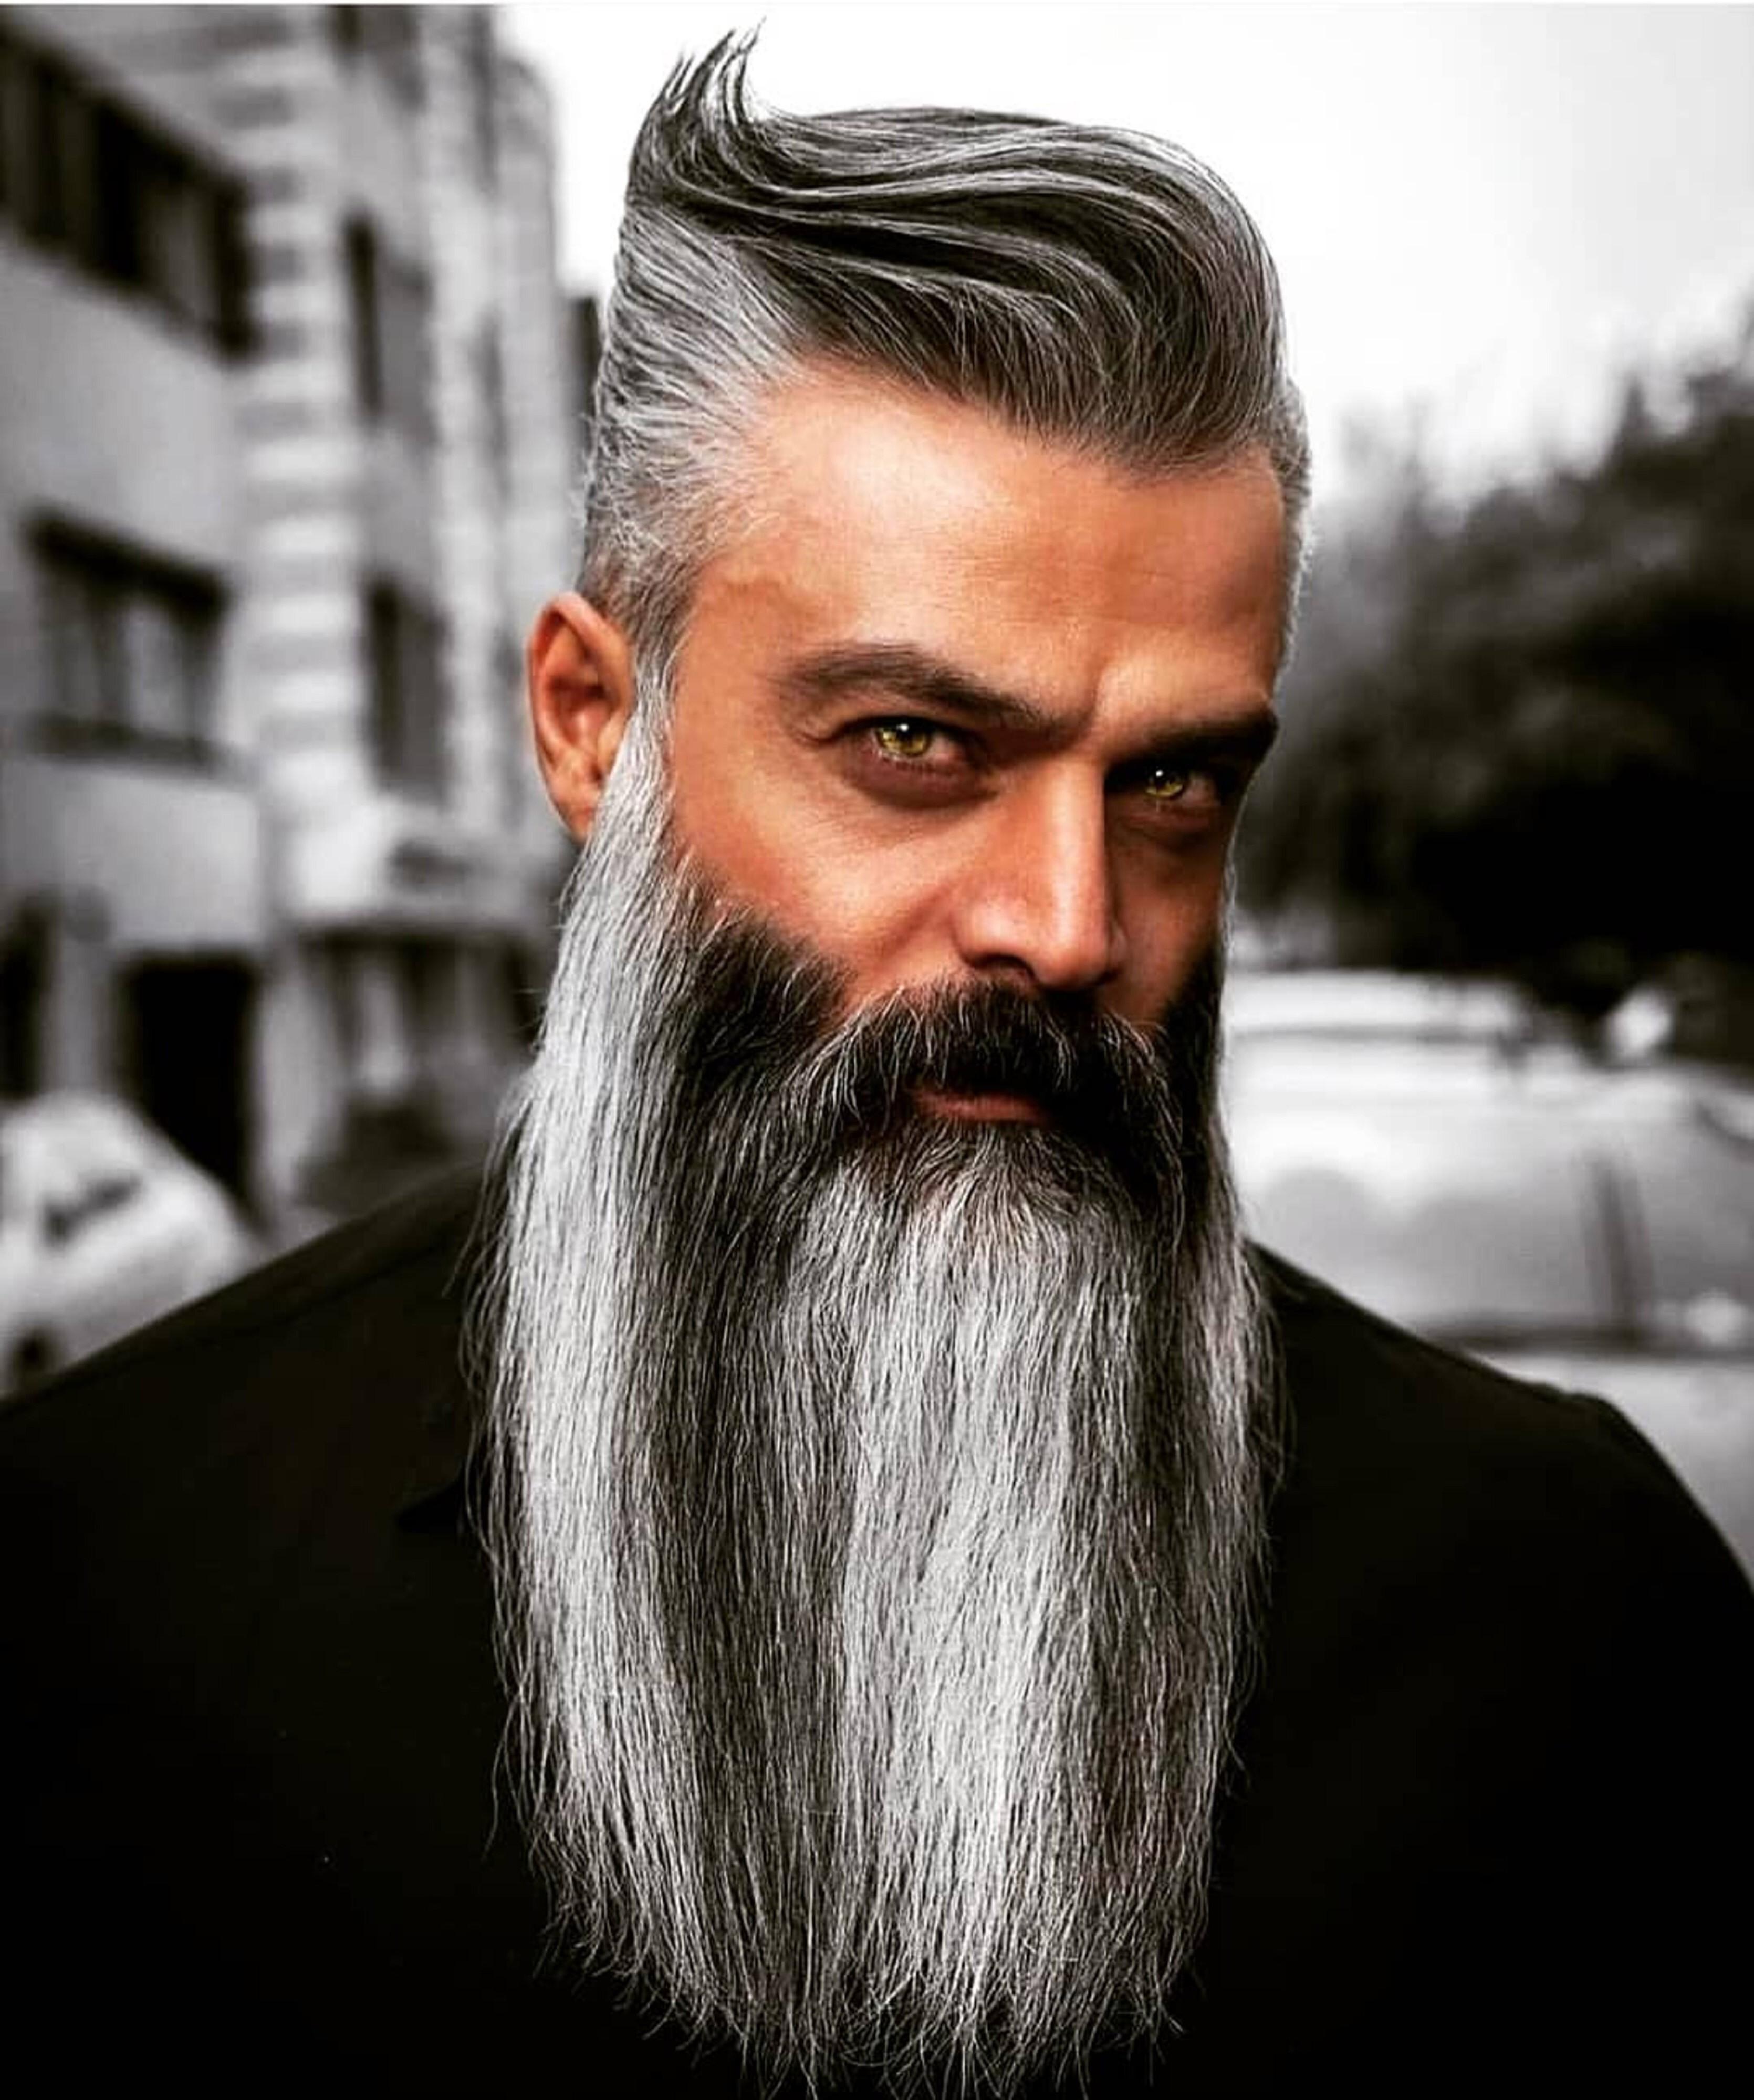 A long salt and pepper beard for trendy look.